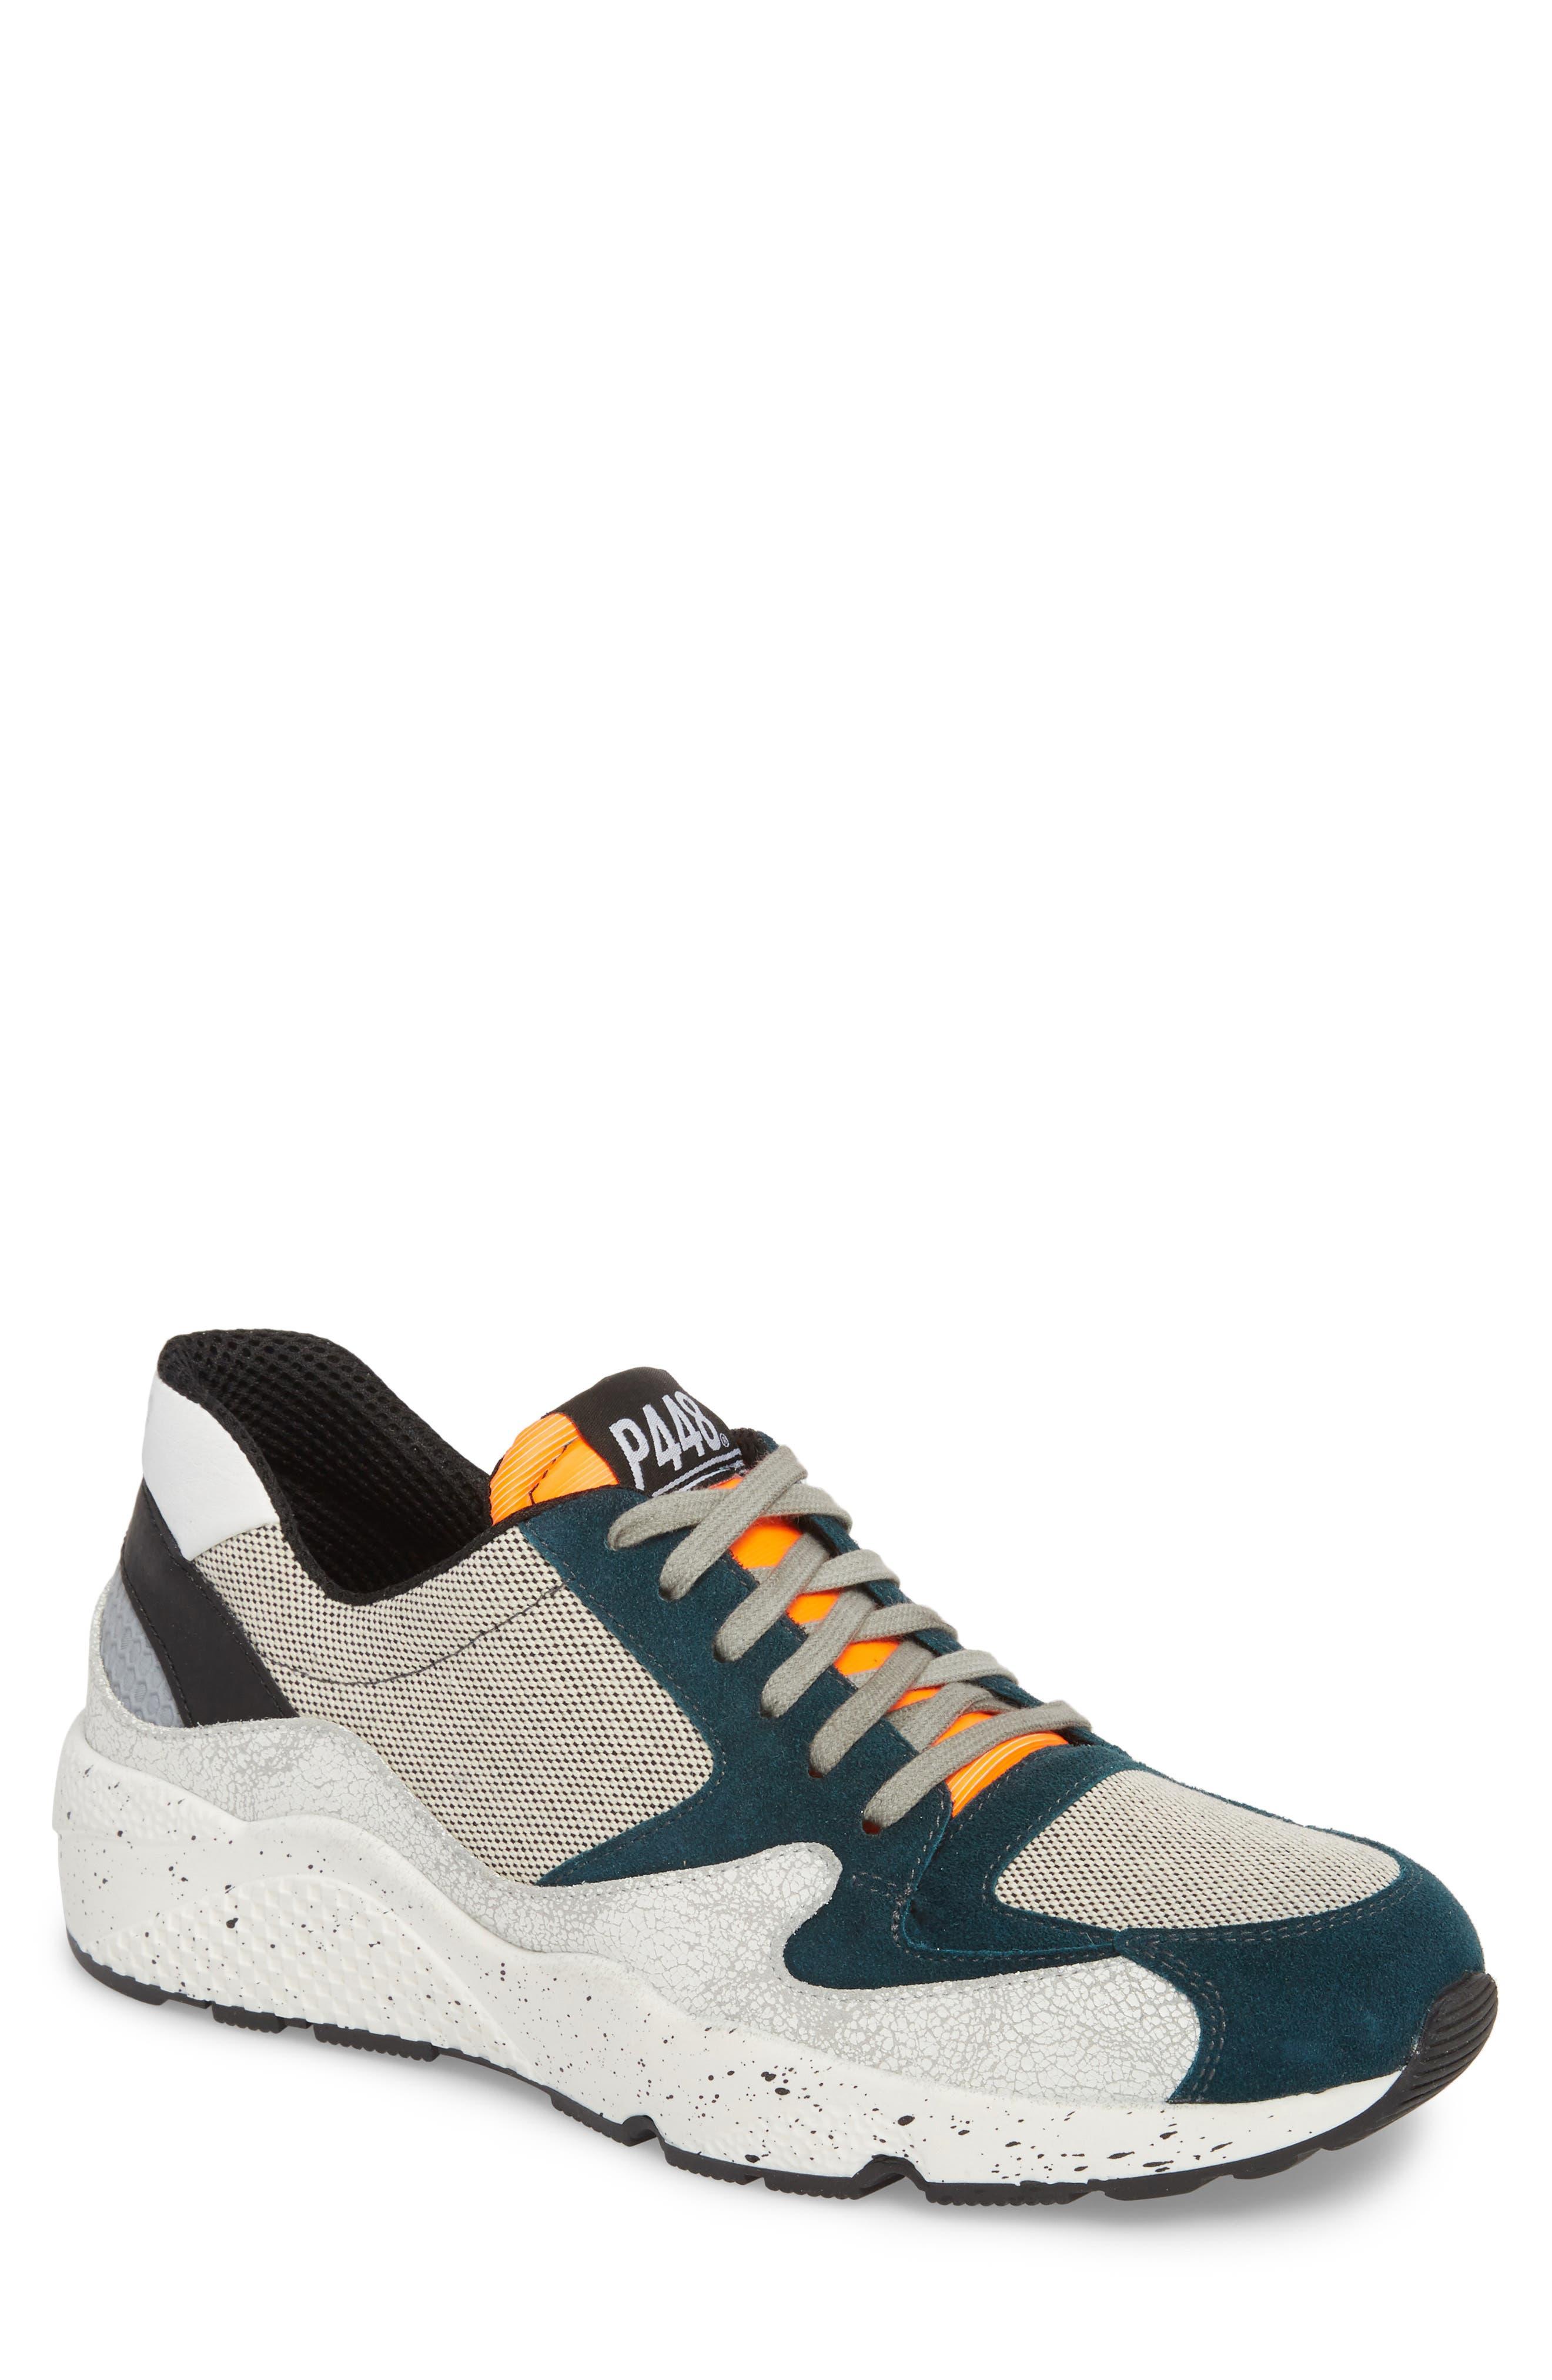 America Low Top Sneaker,                         Main,                         color, White